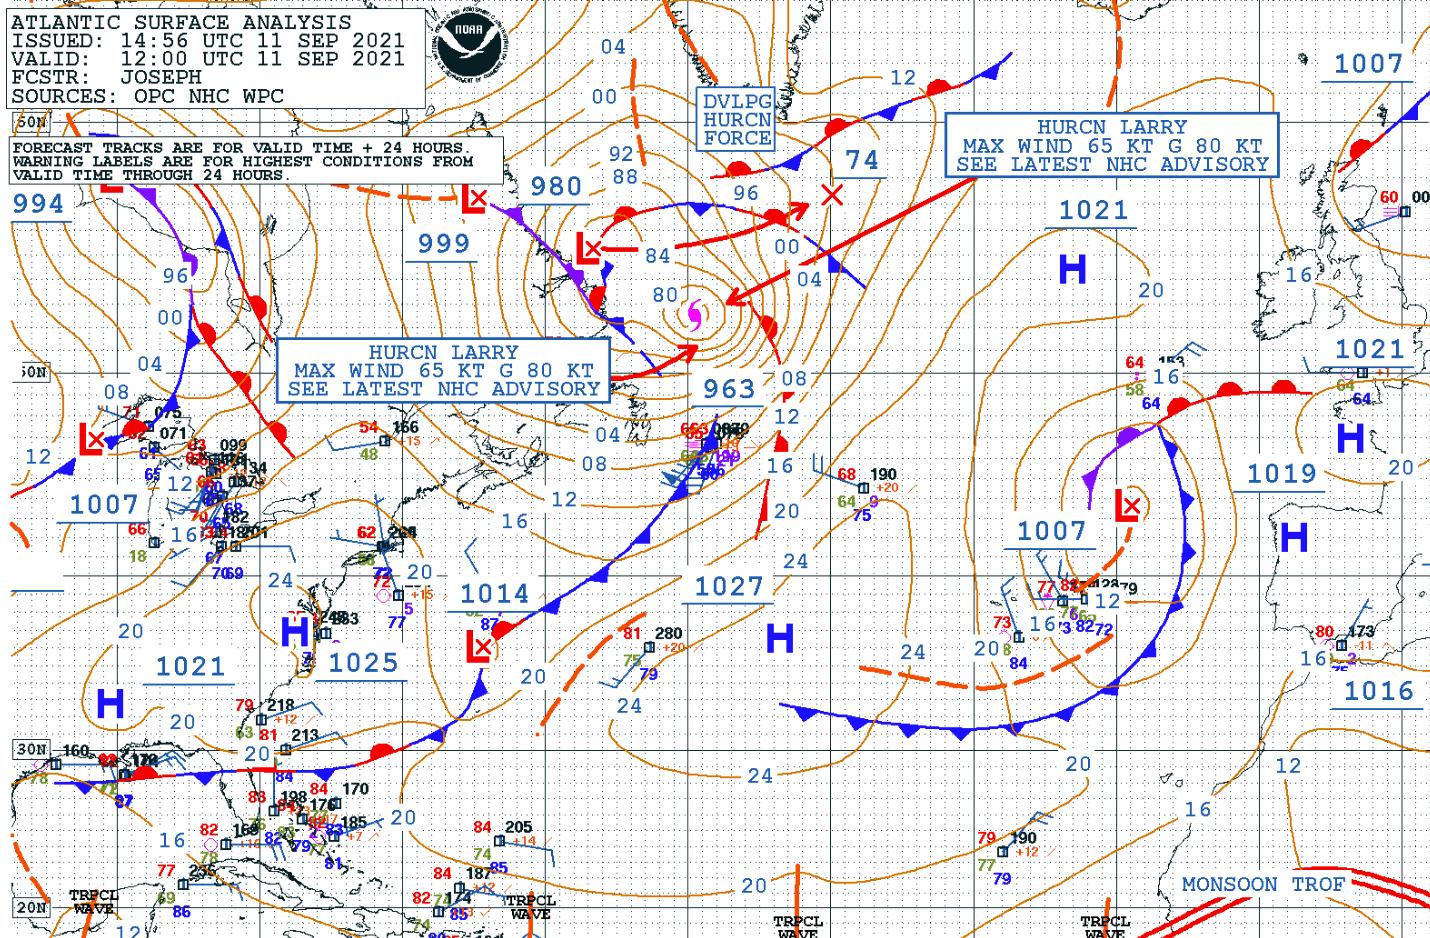 atlantic-hurricane-season-2021-larry-winter-storm-forecast-snow-greenland-analysis